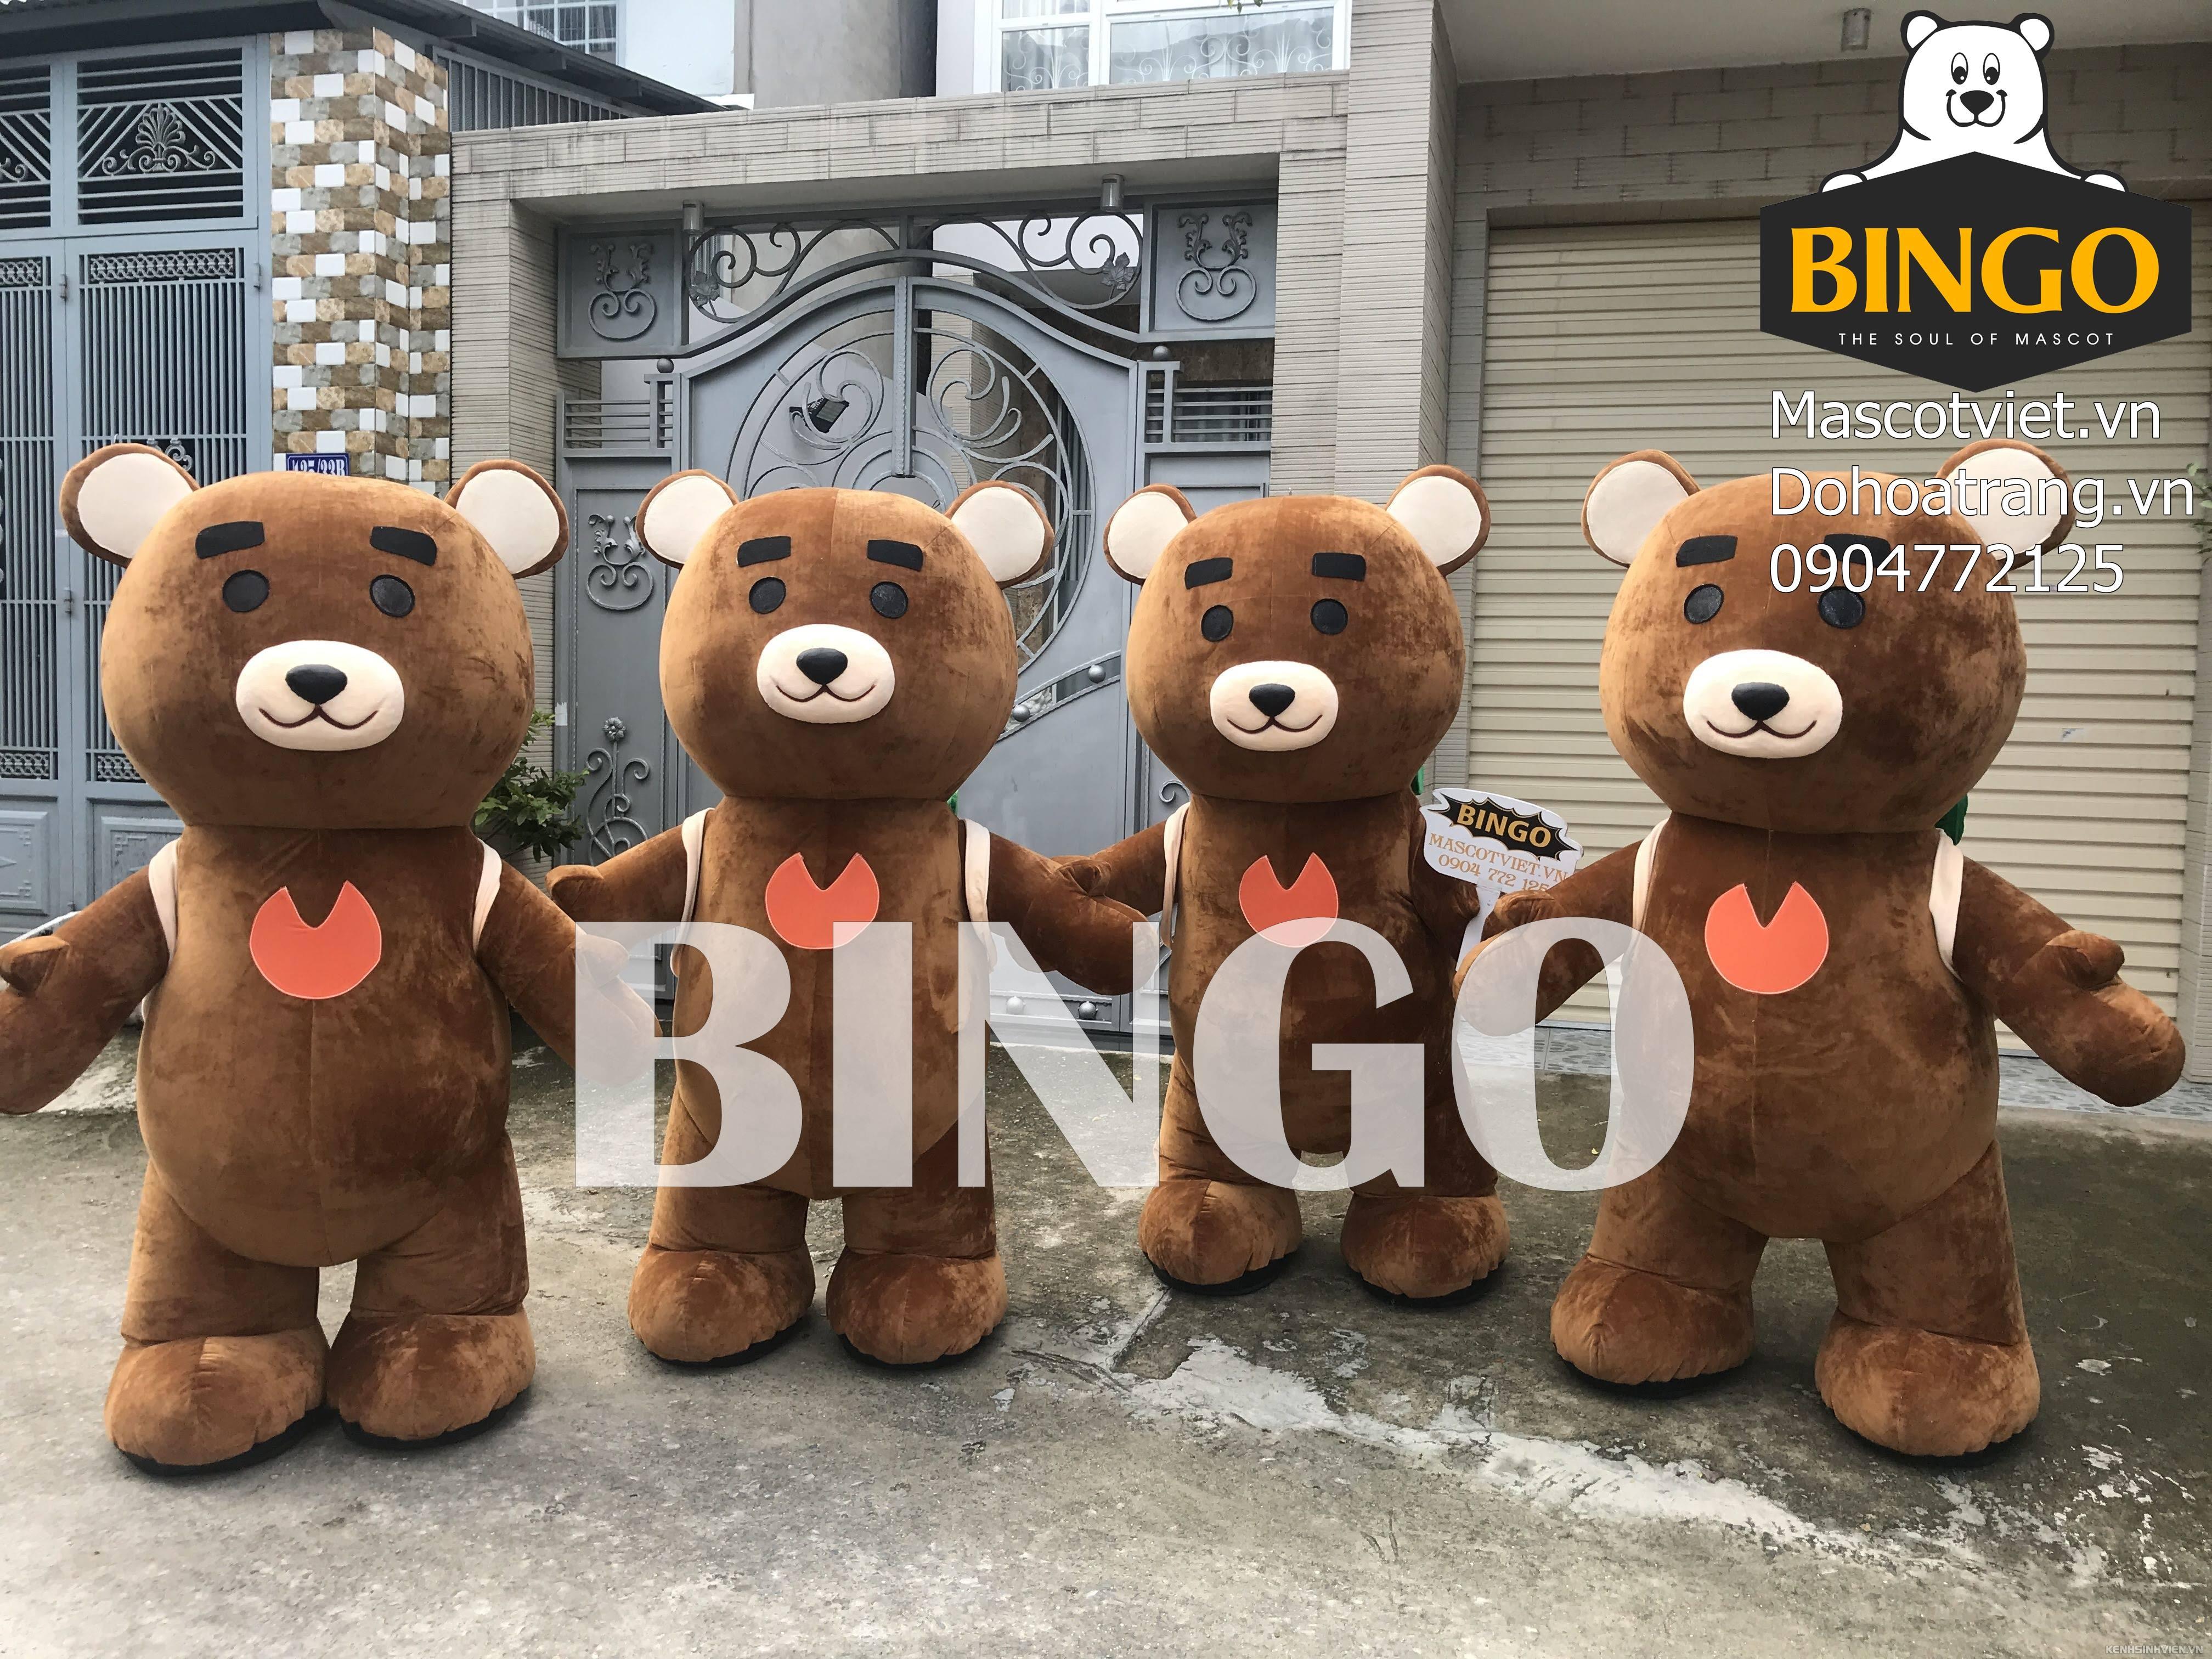 mascot-hoi-con-gau-01-bingo-costumes-0904772125.jpg